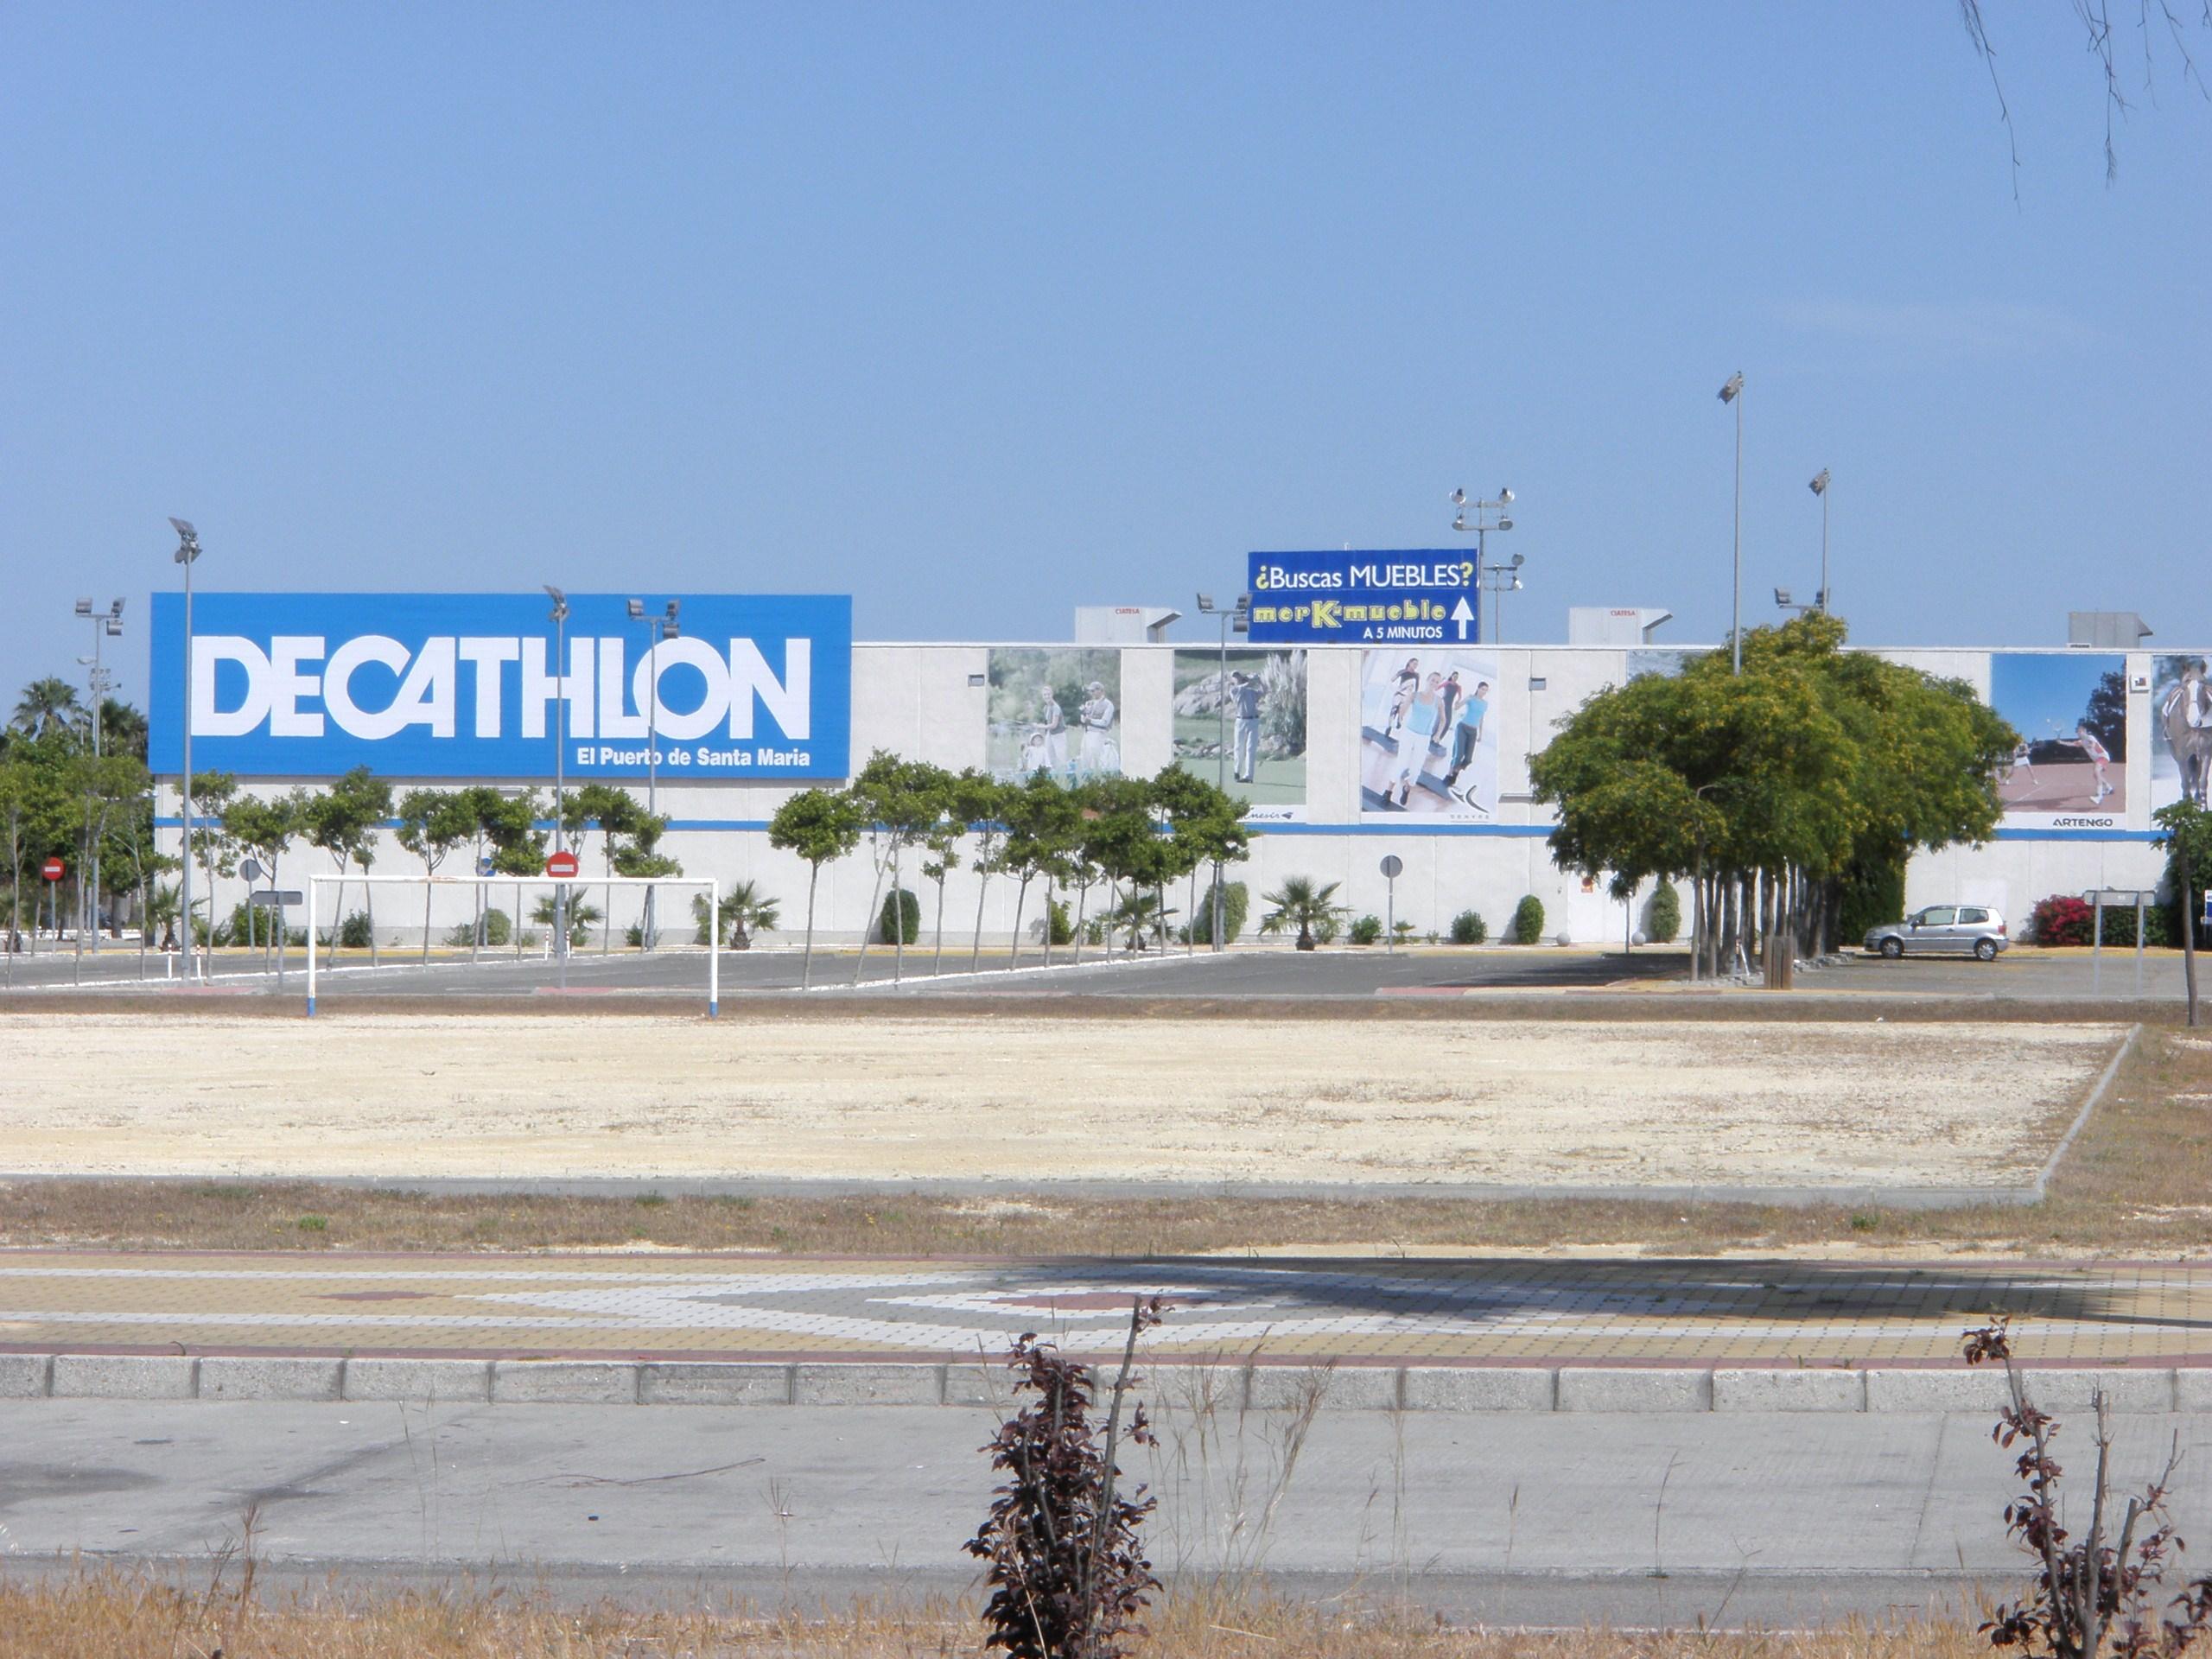 Archivo decathlon de el puerto de santa mar a c diz espa wikipedia la enciclopedia libre - Tren el puerto de santa maria madrid ...